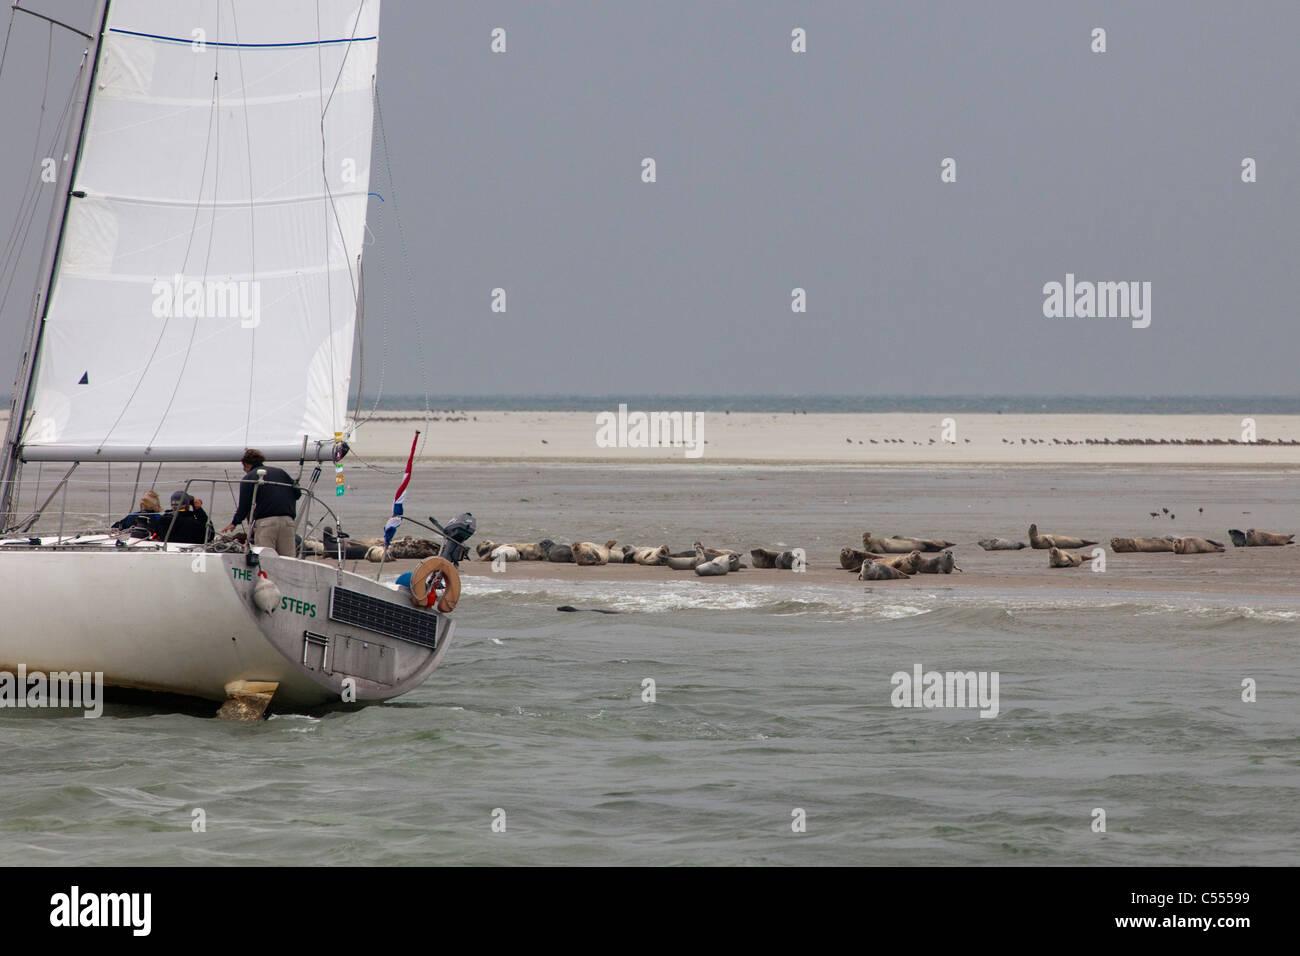 Hollum, Ameland Island, belonging to Wadden Sea Islands. Unesco World Heritage Site. Seals and passing sailing boat. - Stock Image